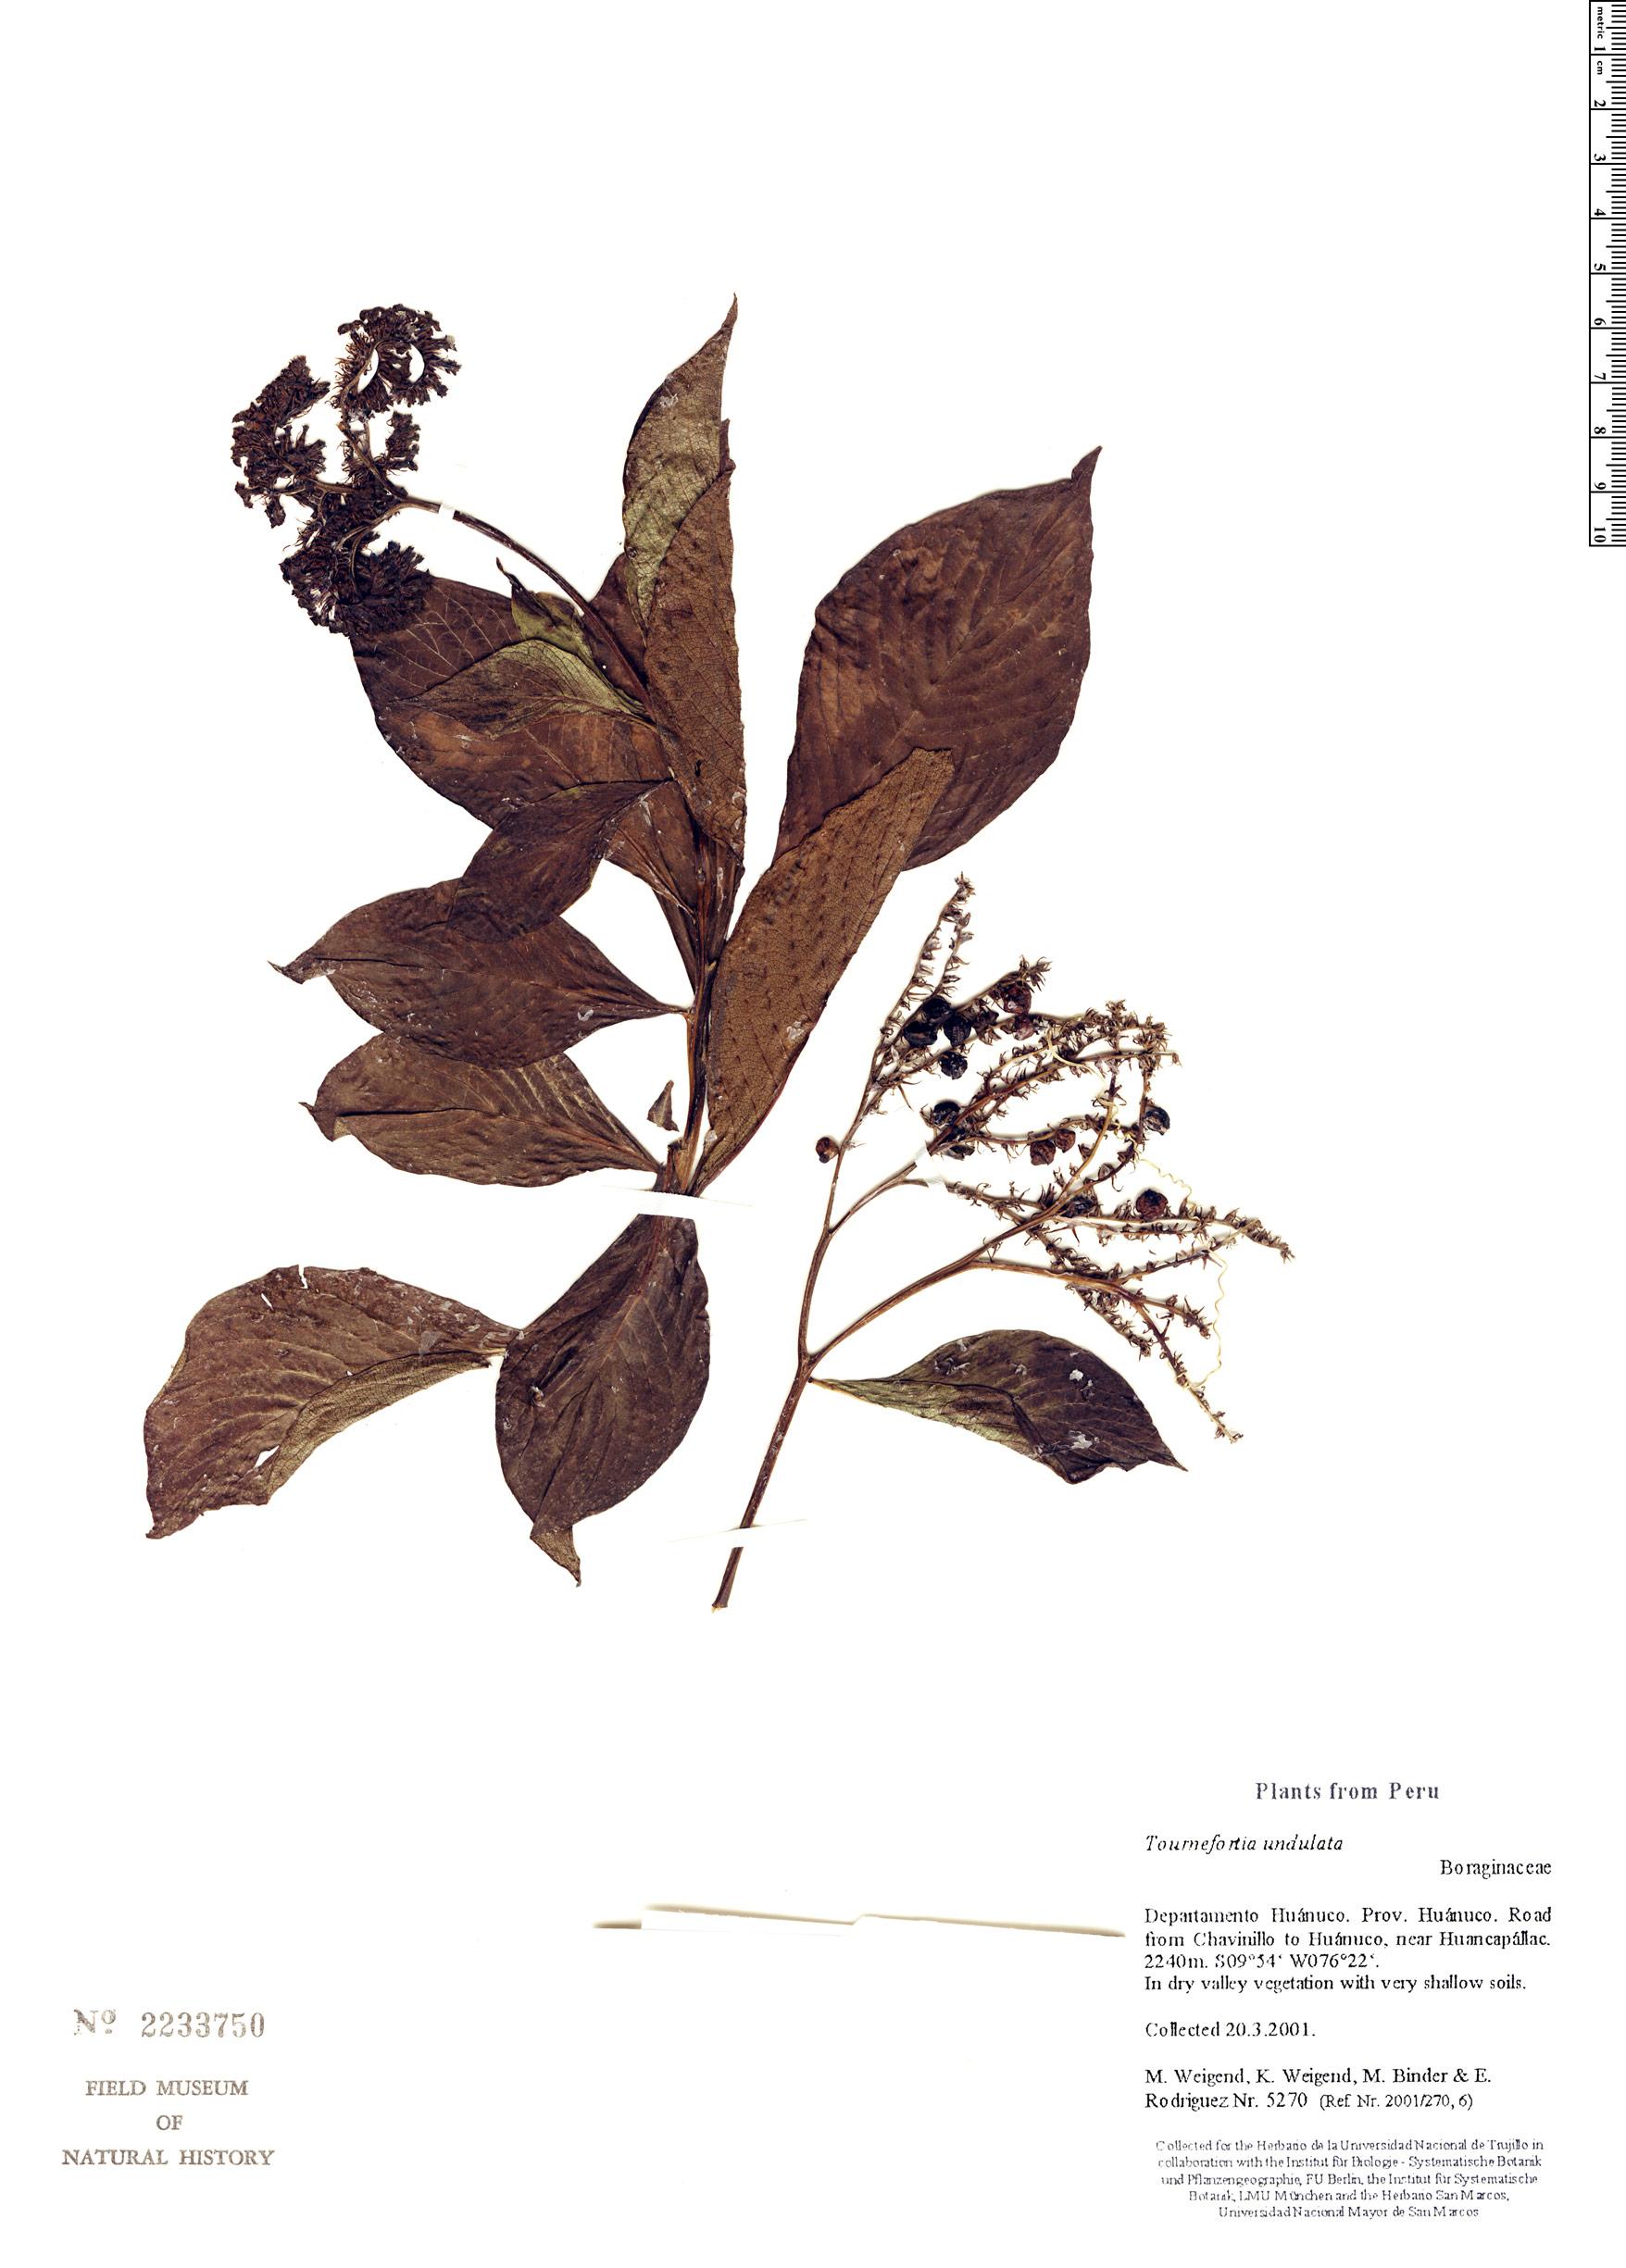 Specimen: Tournefortia undulata